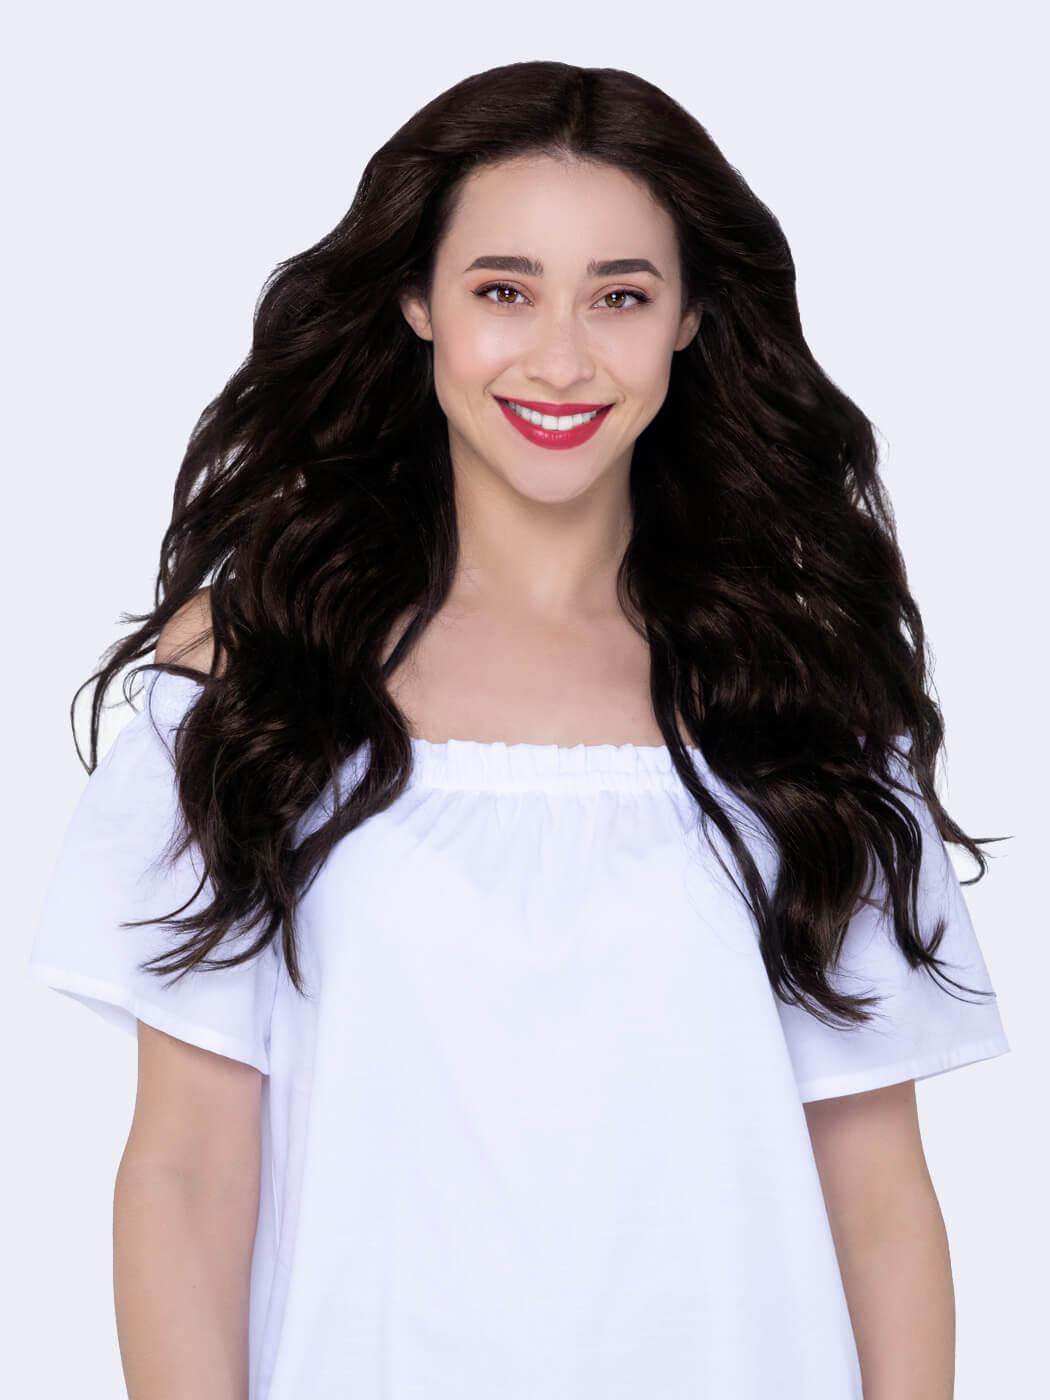 Natural Hair Clip Ins   Real Human Hair Extensions   20 Inch Hair Extensions   Hair Extensions For Thin Hair   Remy Hair